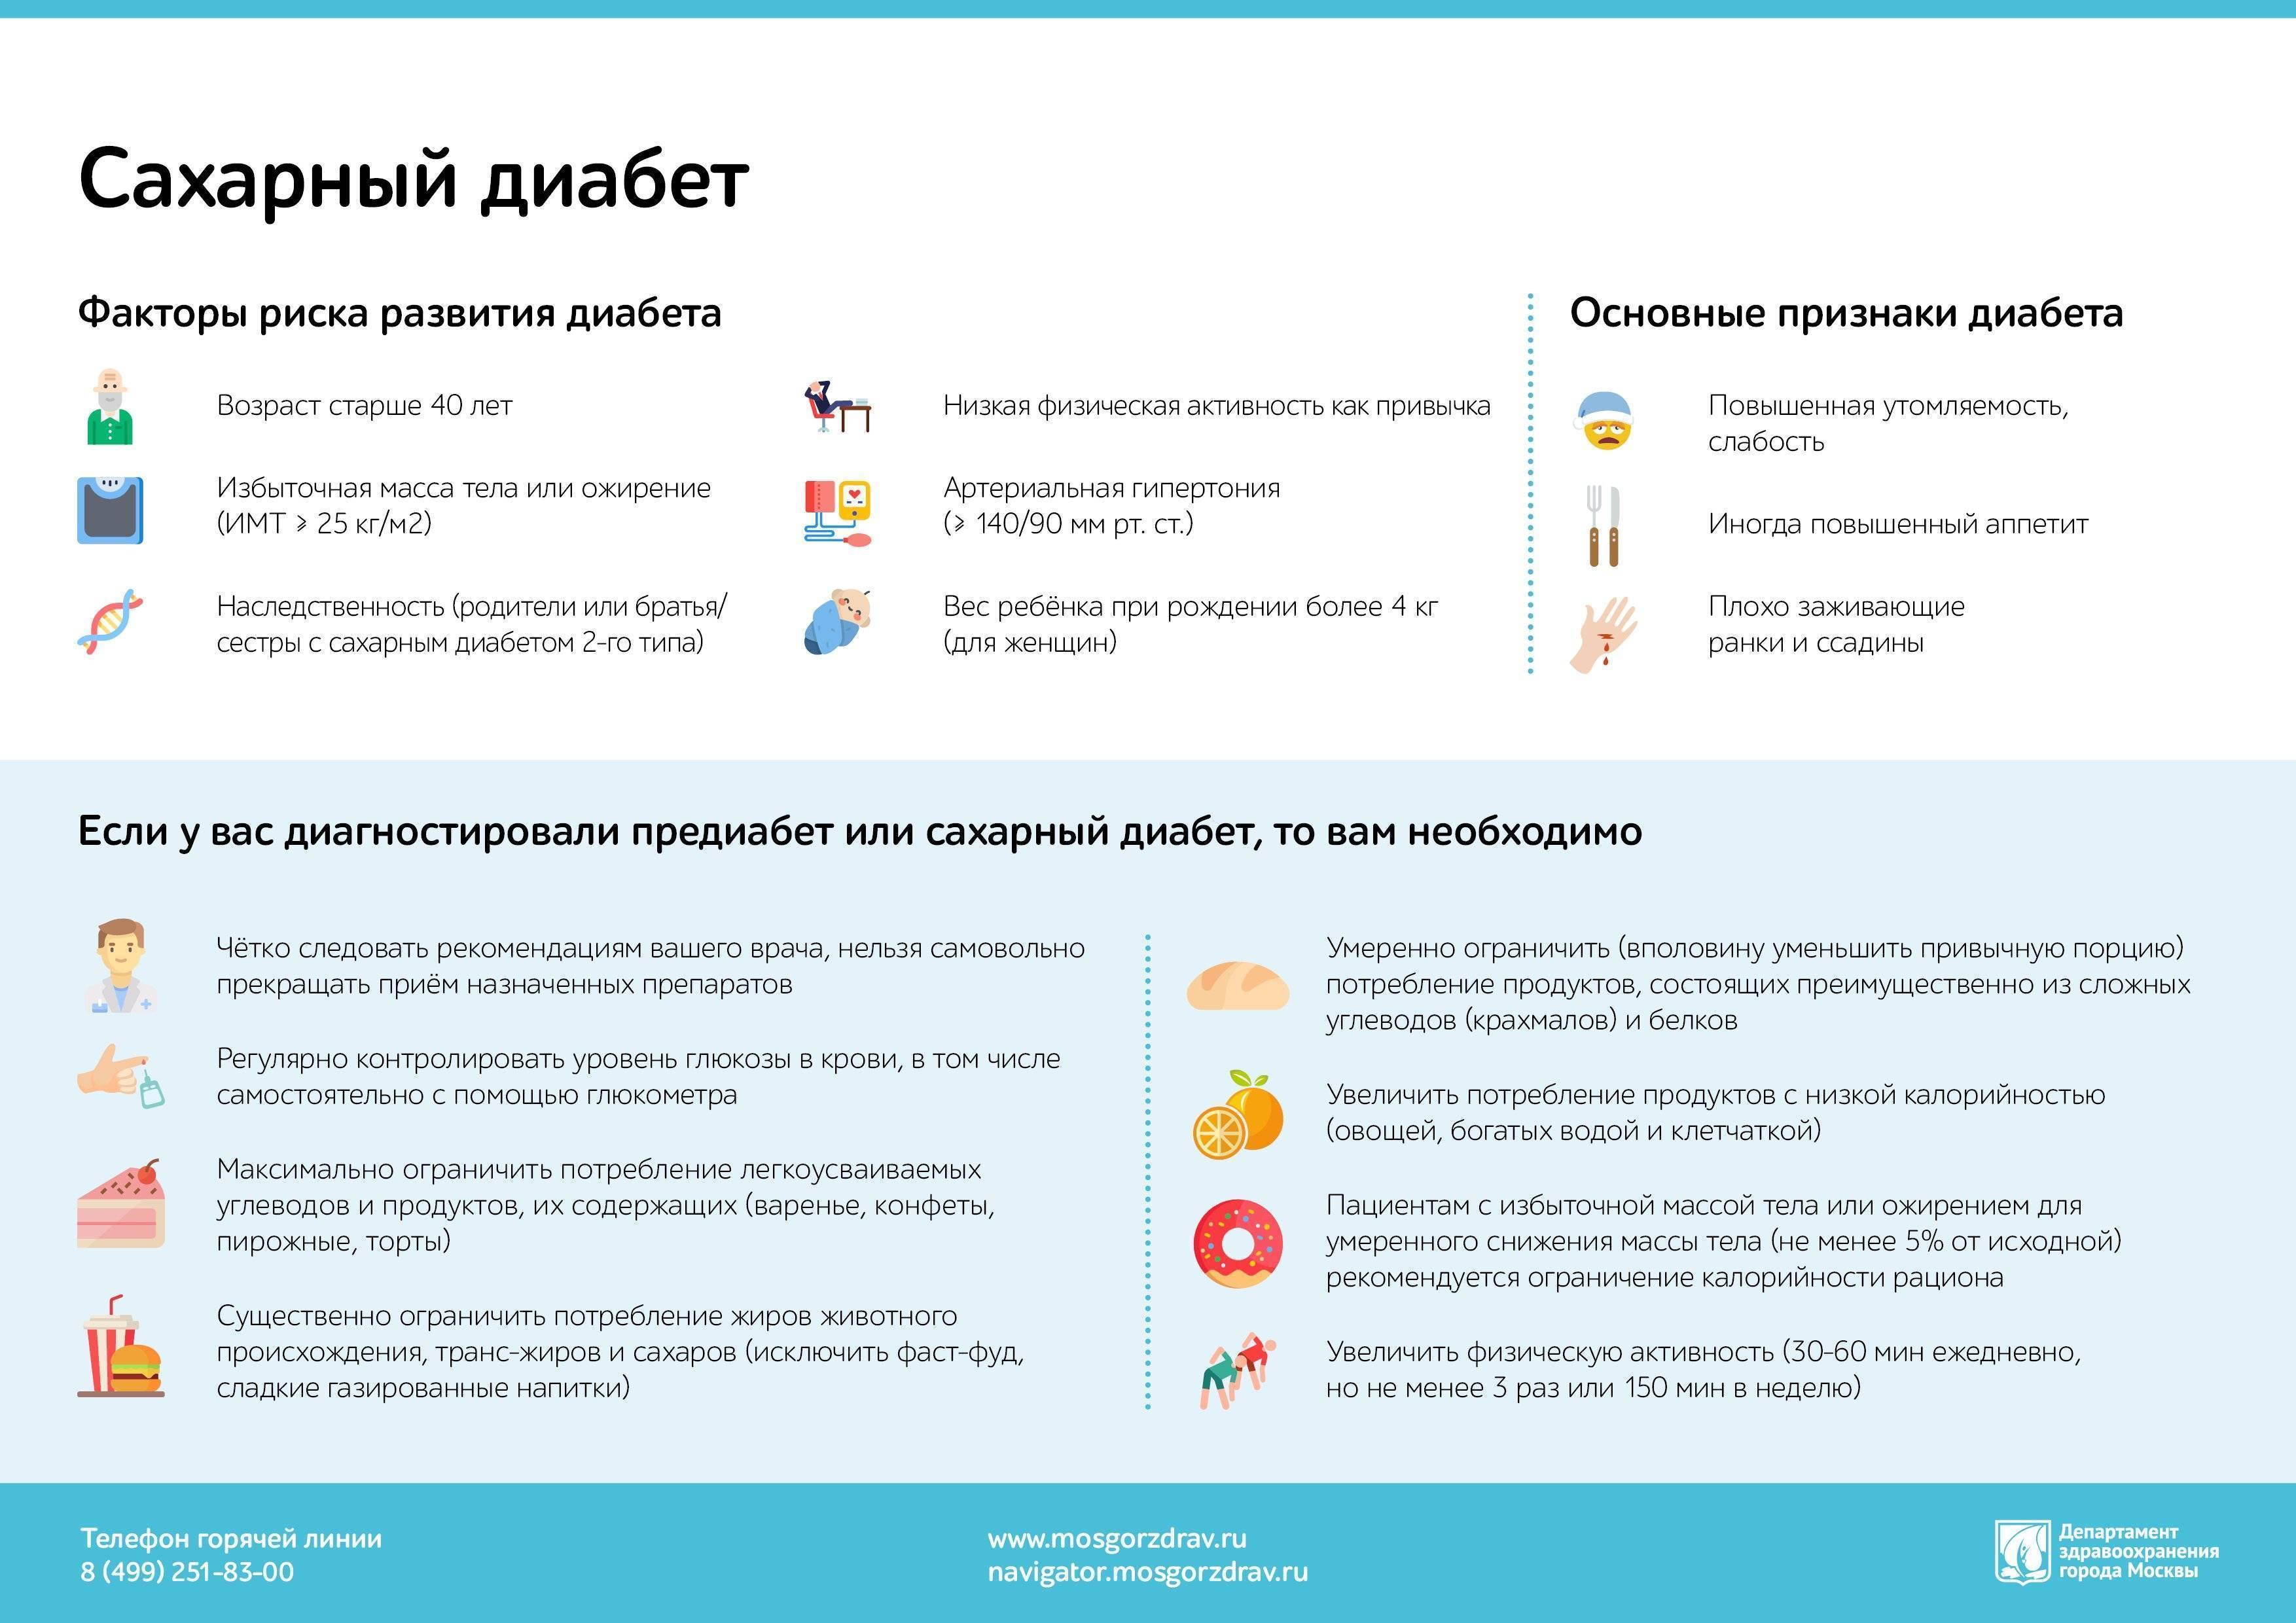 Норма сахара в крови у детей: таблица и расшифровка